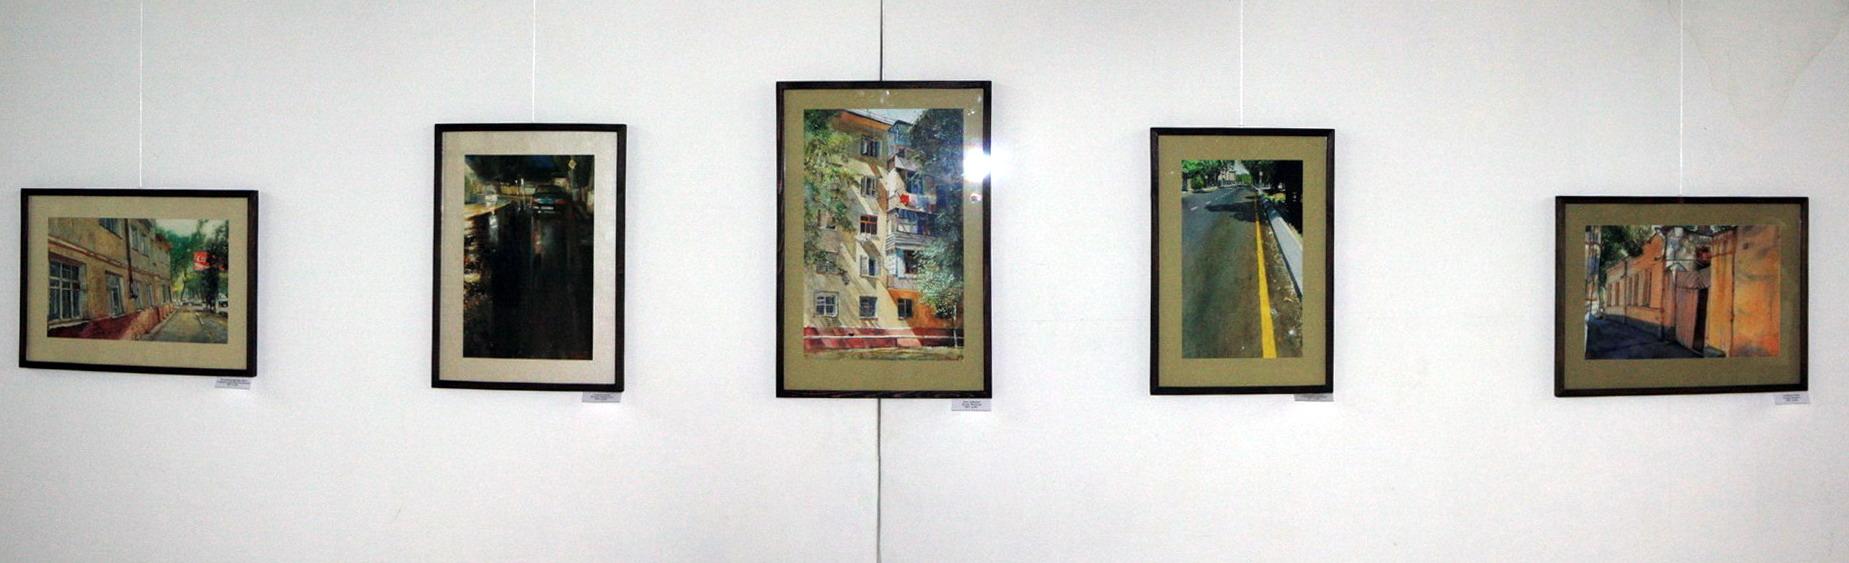 [4] Евгений Панов. Экспозиция. 2017. ЦВЗ